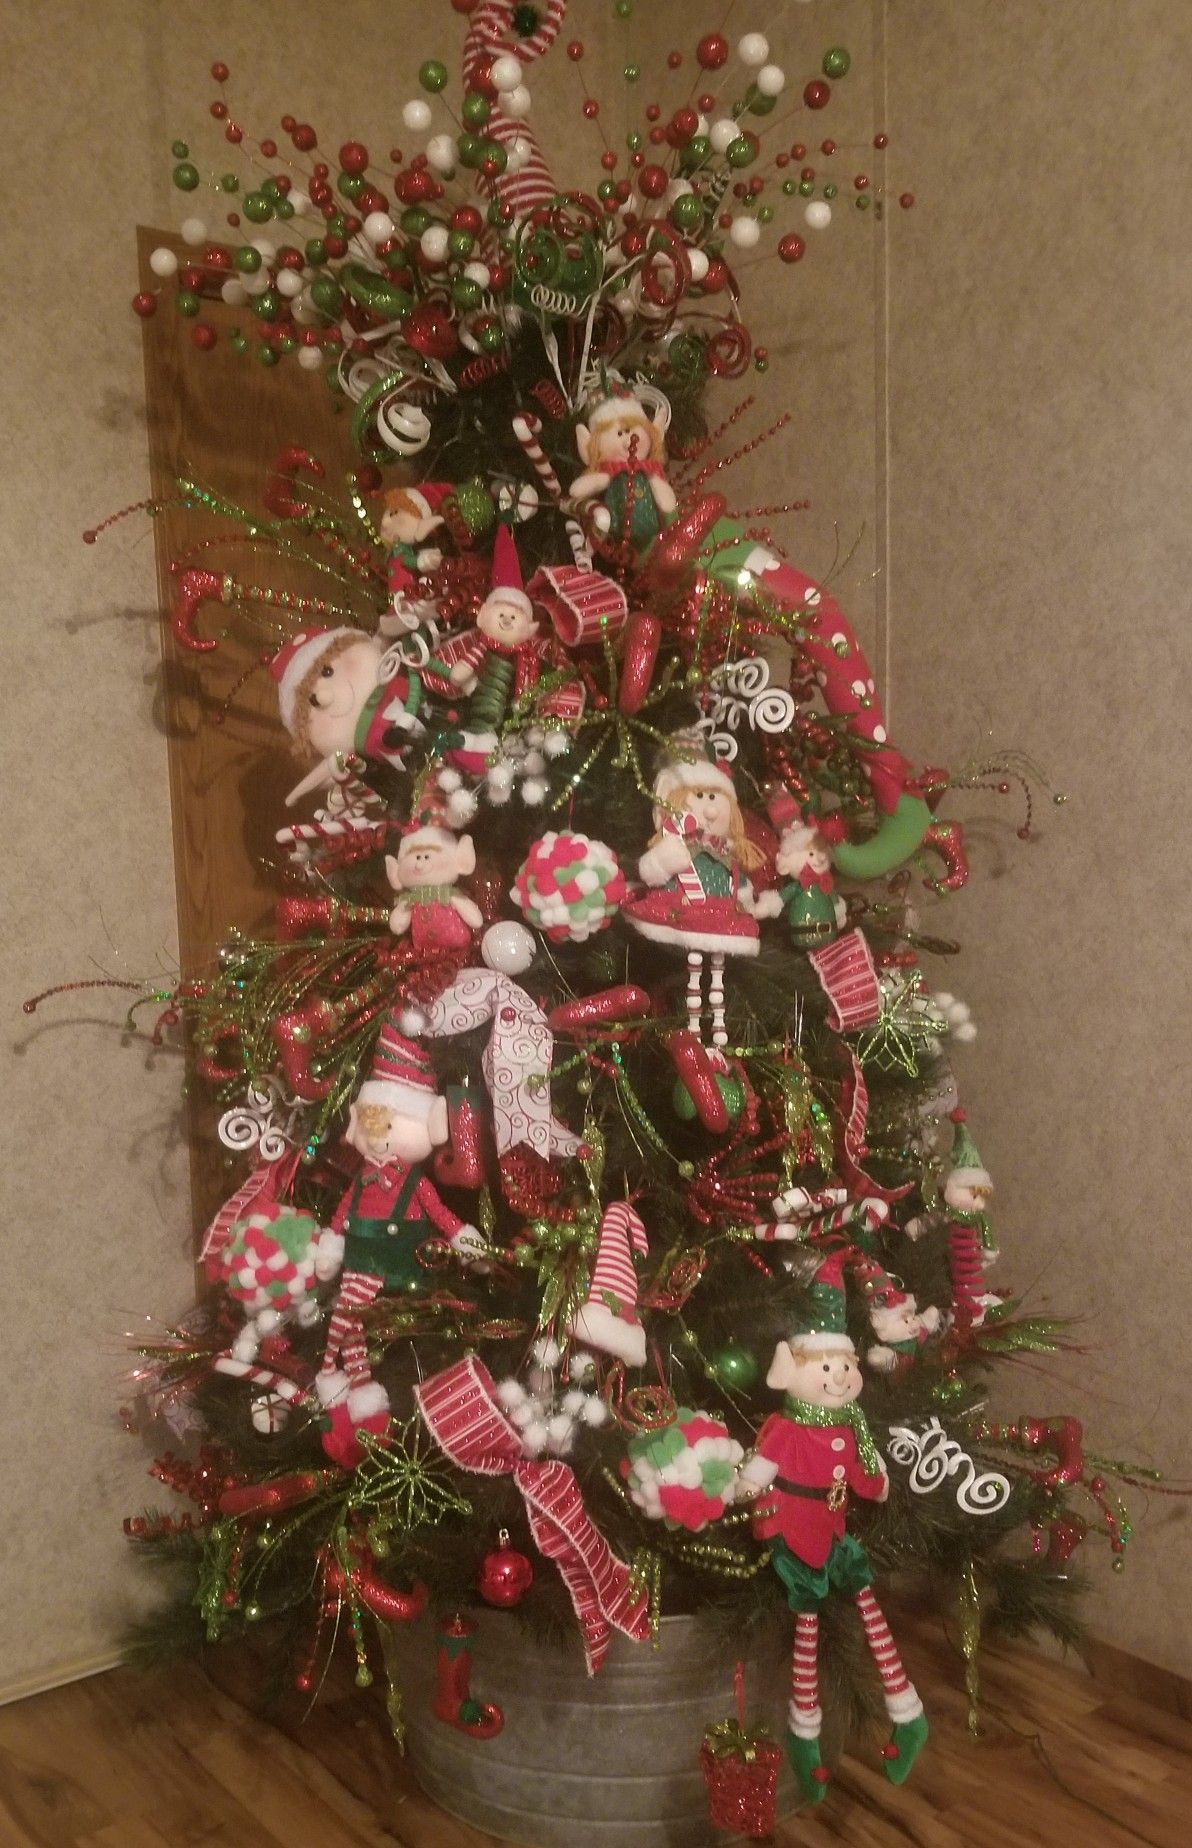 Raz Christmas Trees Creative Christmas Trees Whimsical Christmas Trees Christmas Tree Themes